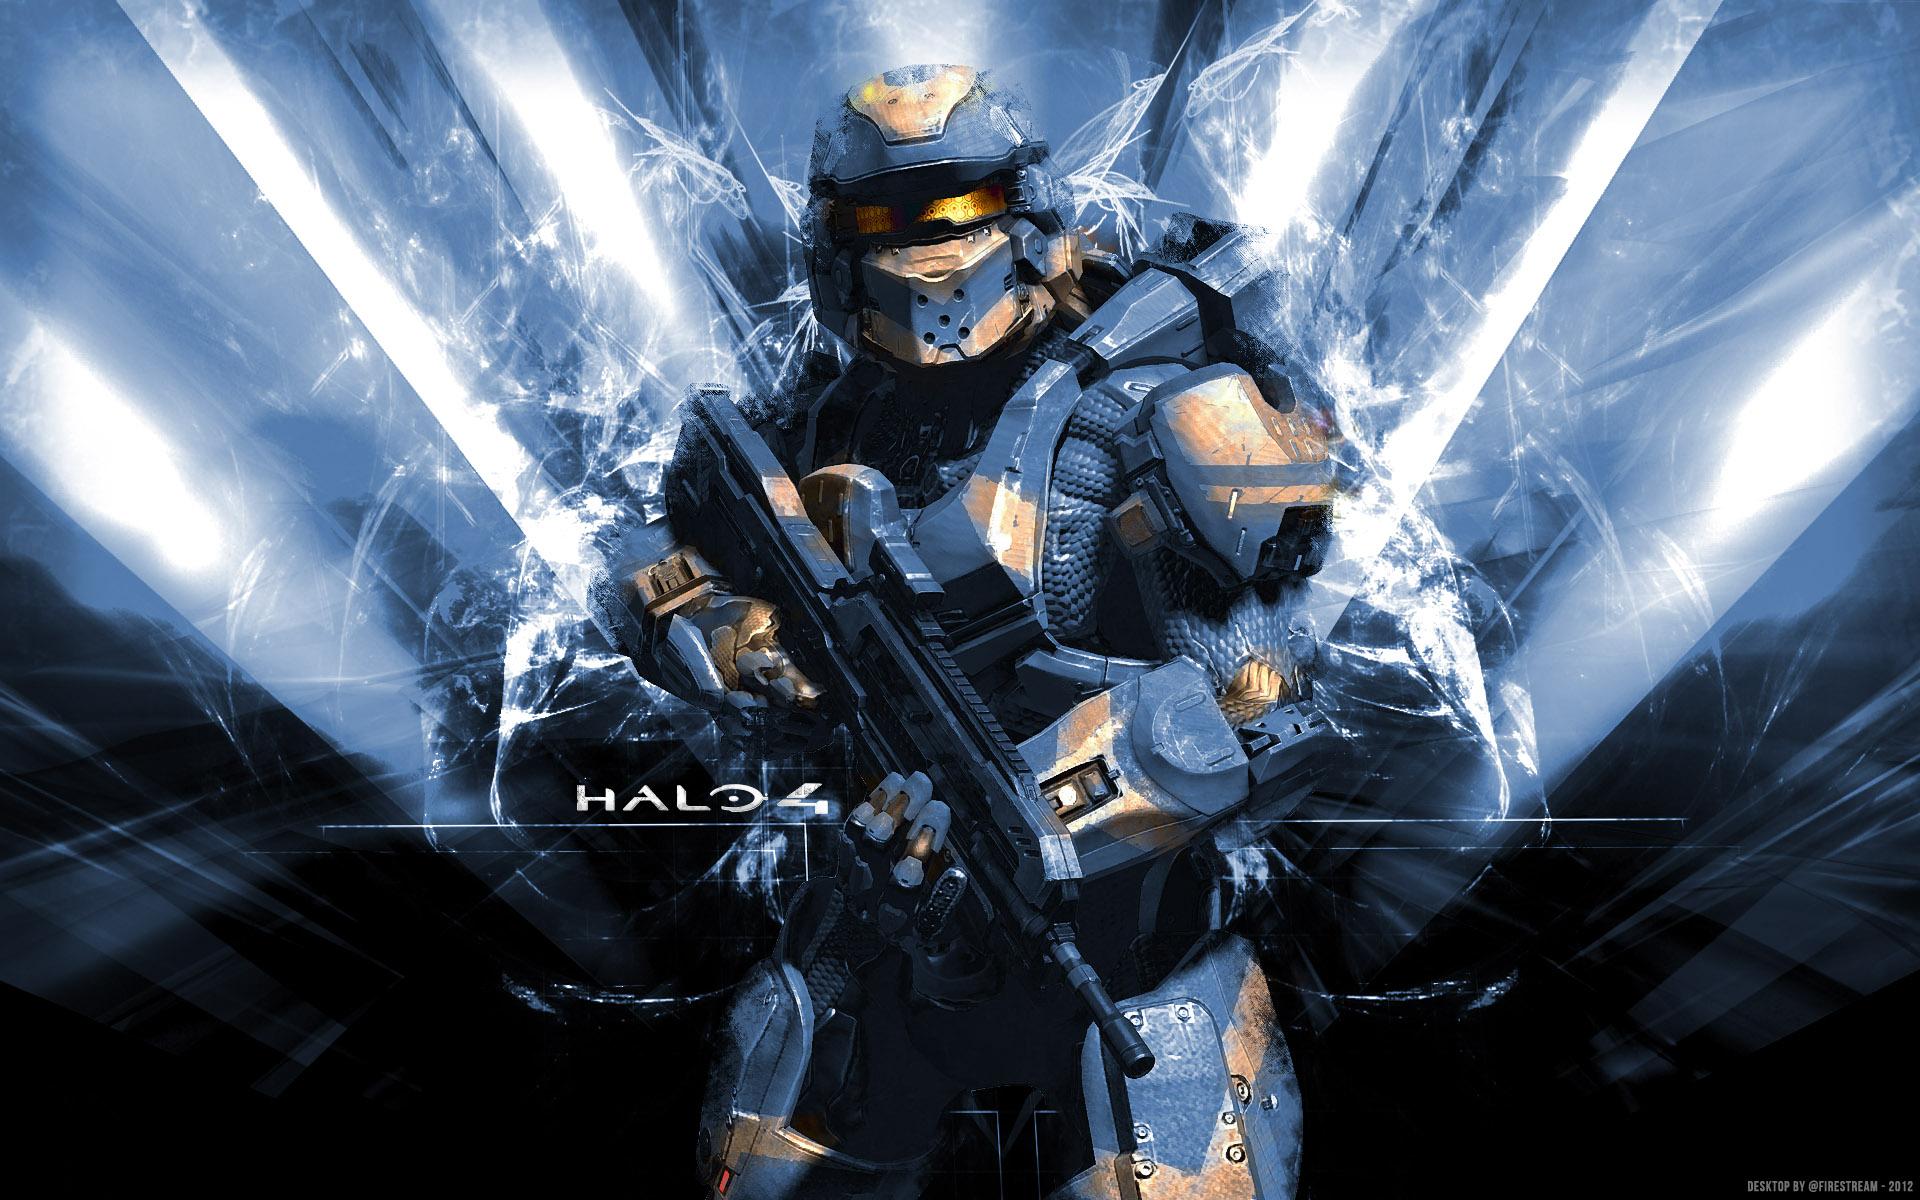 47] Halo 4 Wallpaper on WallpaperSafari 1920x1200